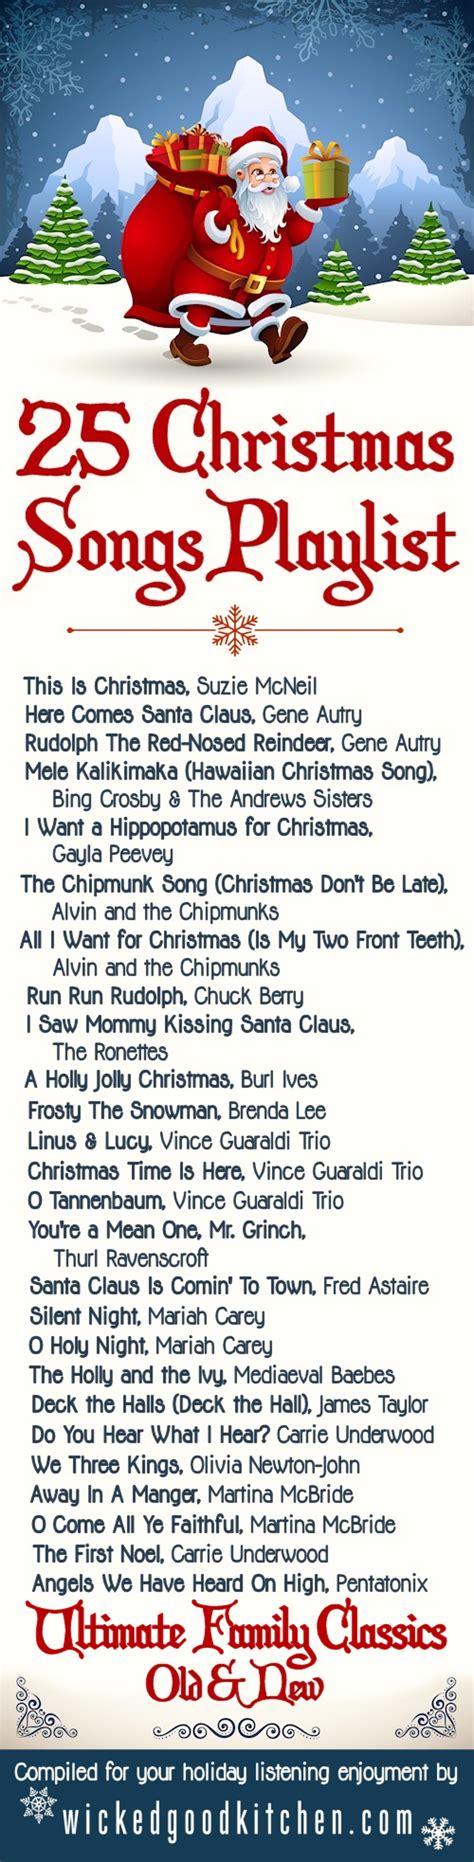 christmas playlist 25 family holiday classics wicked